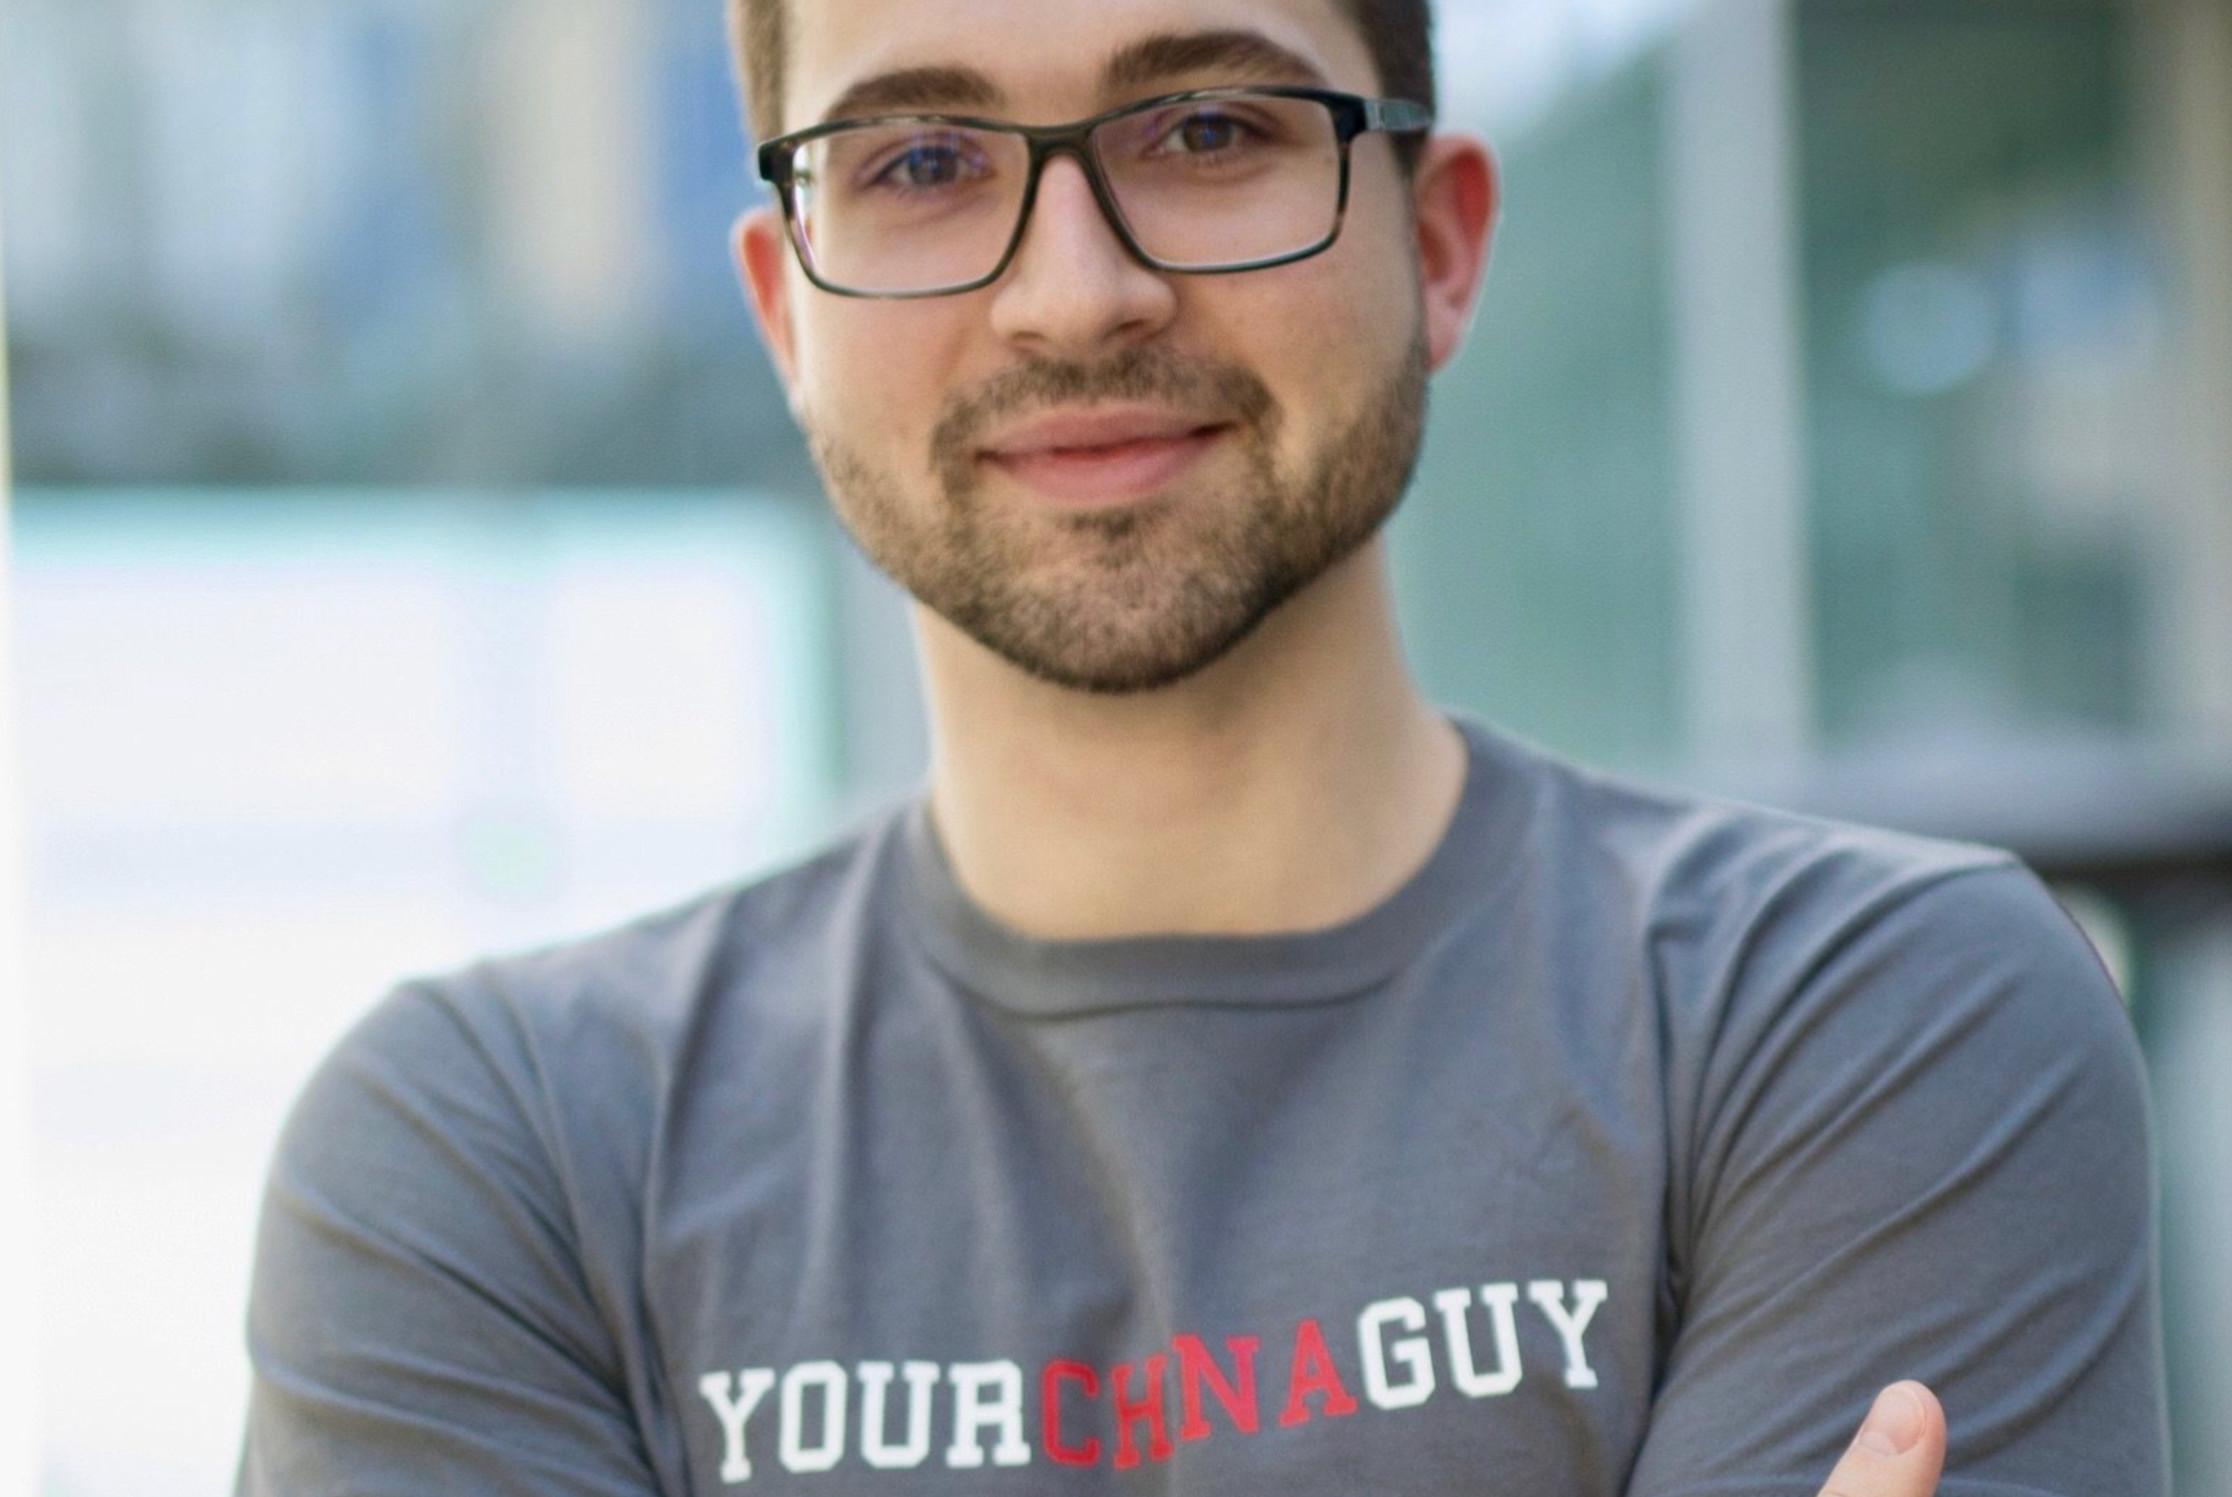 The Community Builder - Jan Smejkal